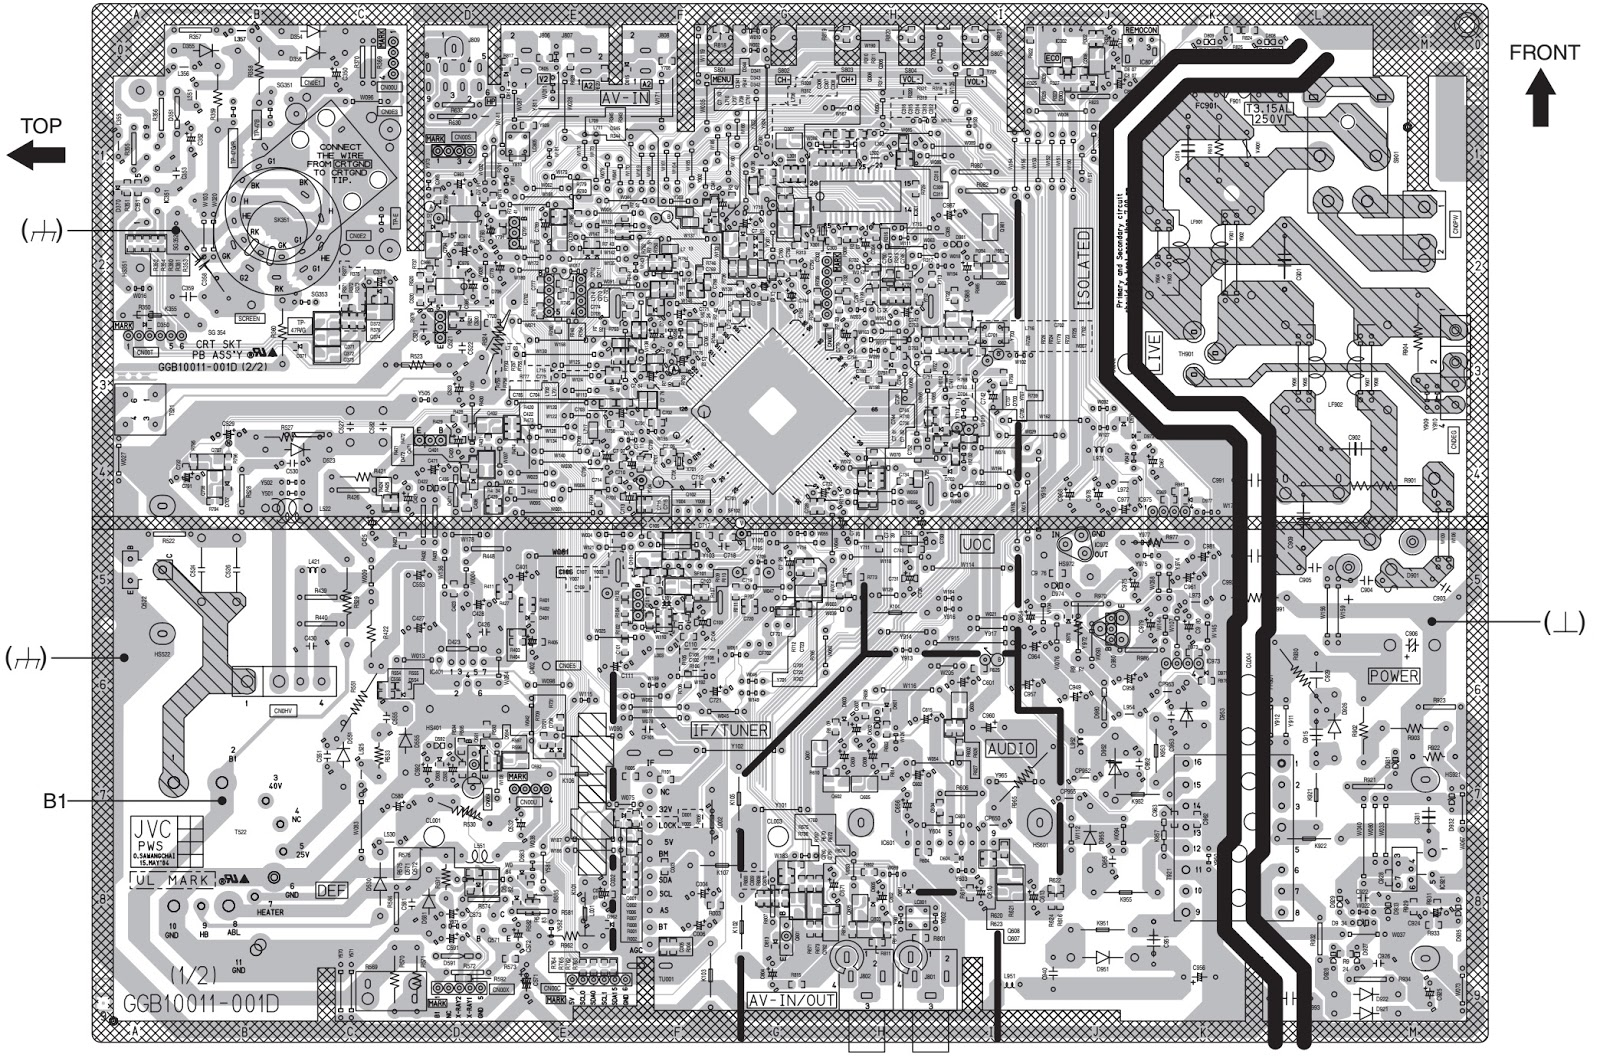 Marvelous Circuit Diagram Jvc Tv Basic Electronics Wiring Diagram Wiring 101 Mecadwellnesstrialsorg